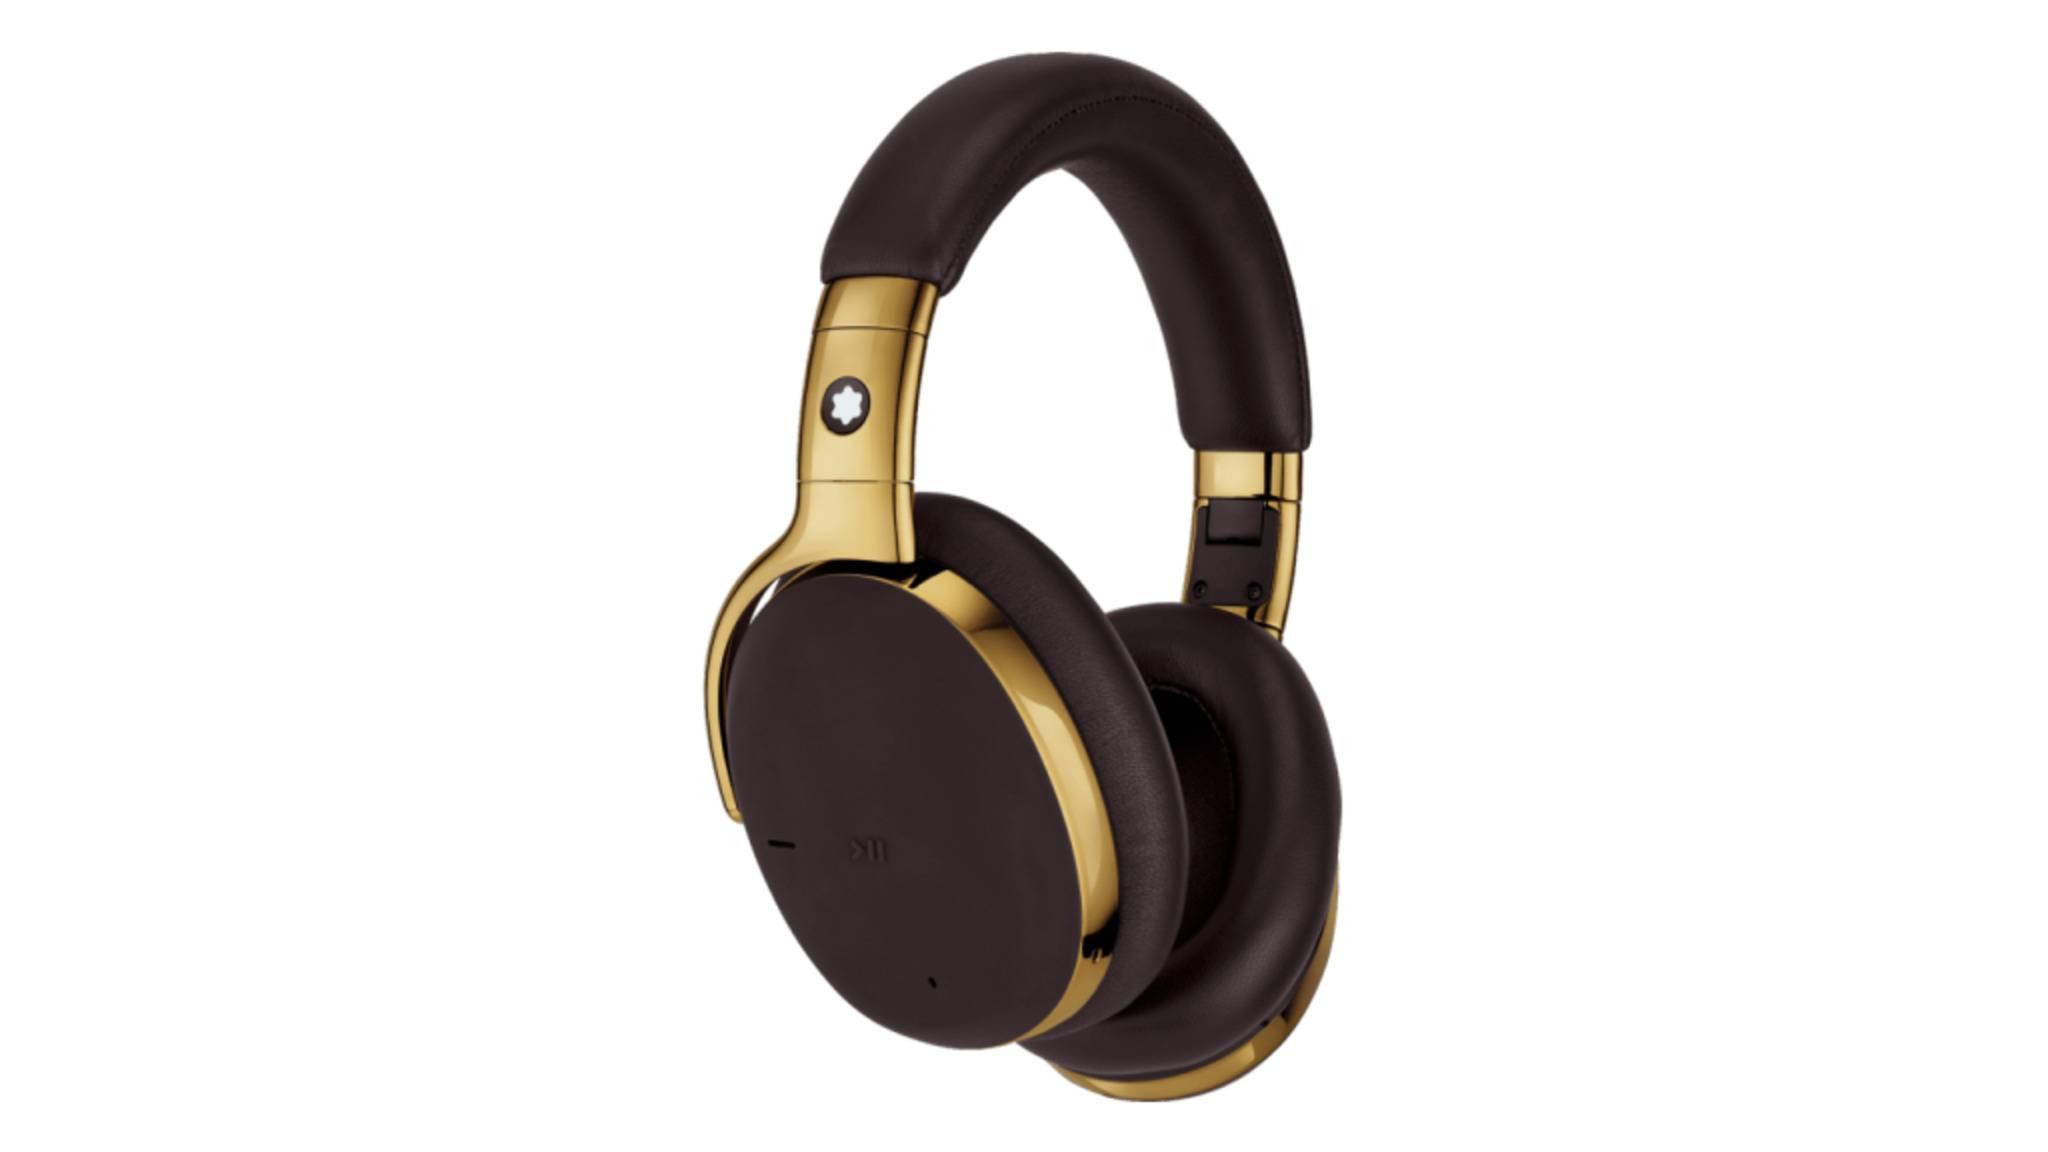 montblanc-smart-headphones-mb-01